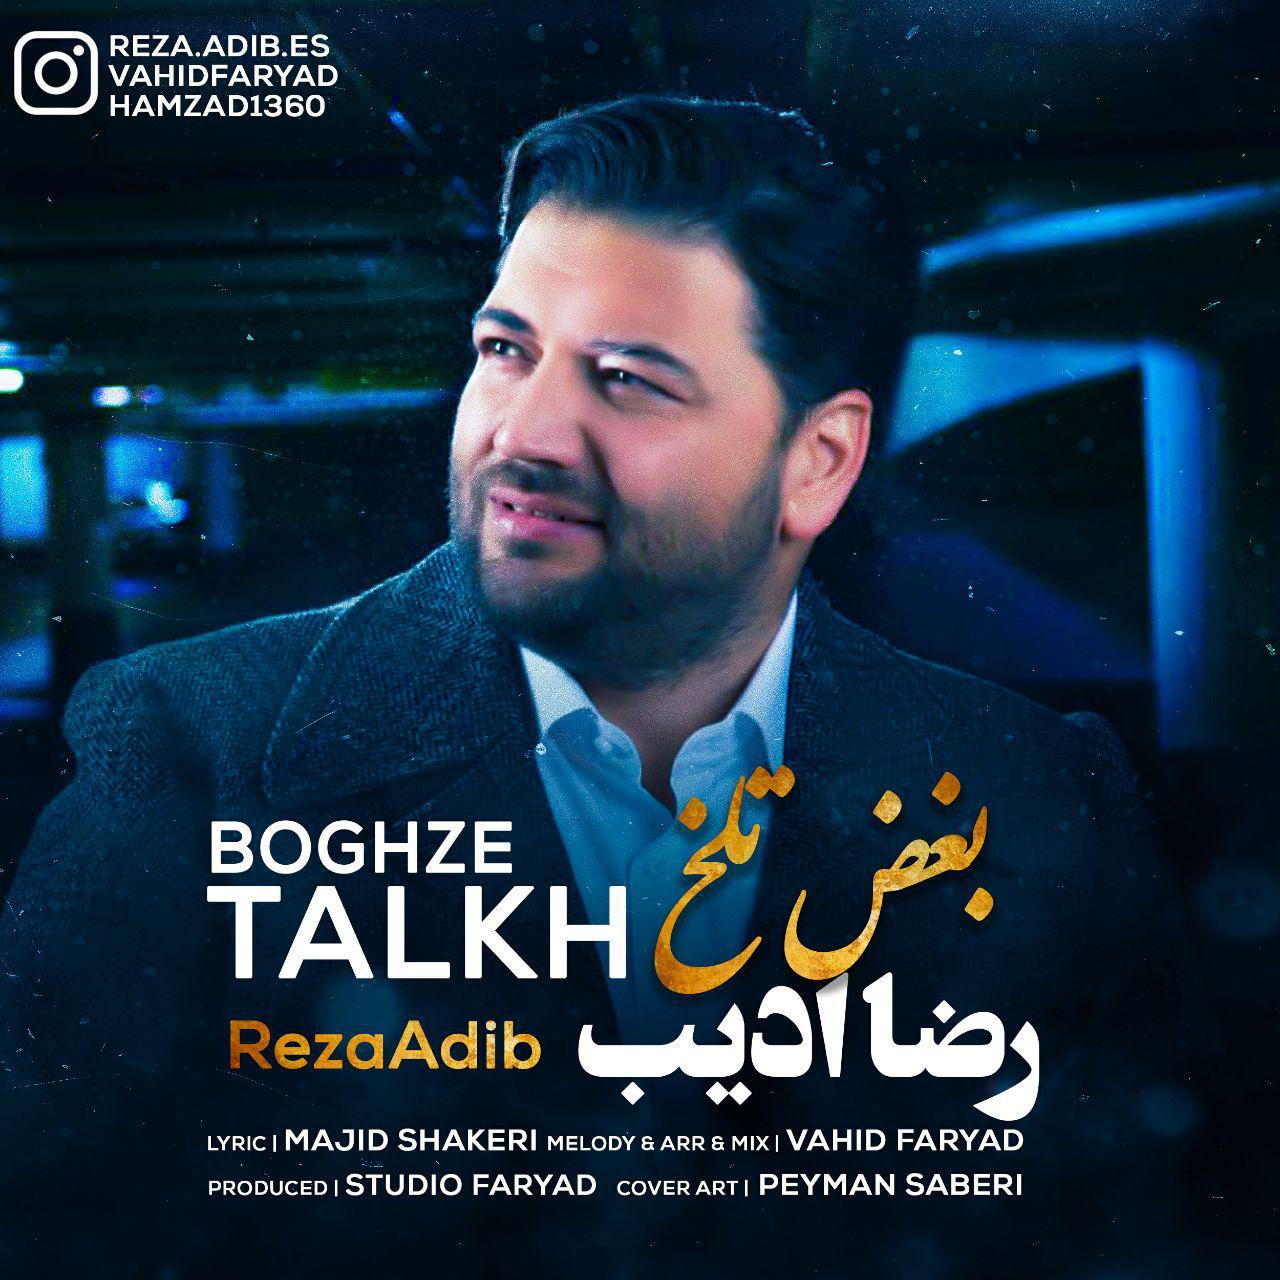 Reza Adib – Boghze Talkh